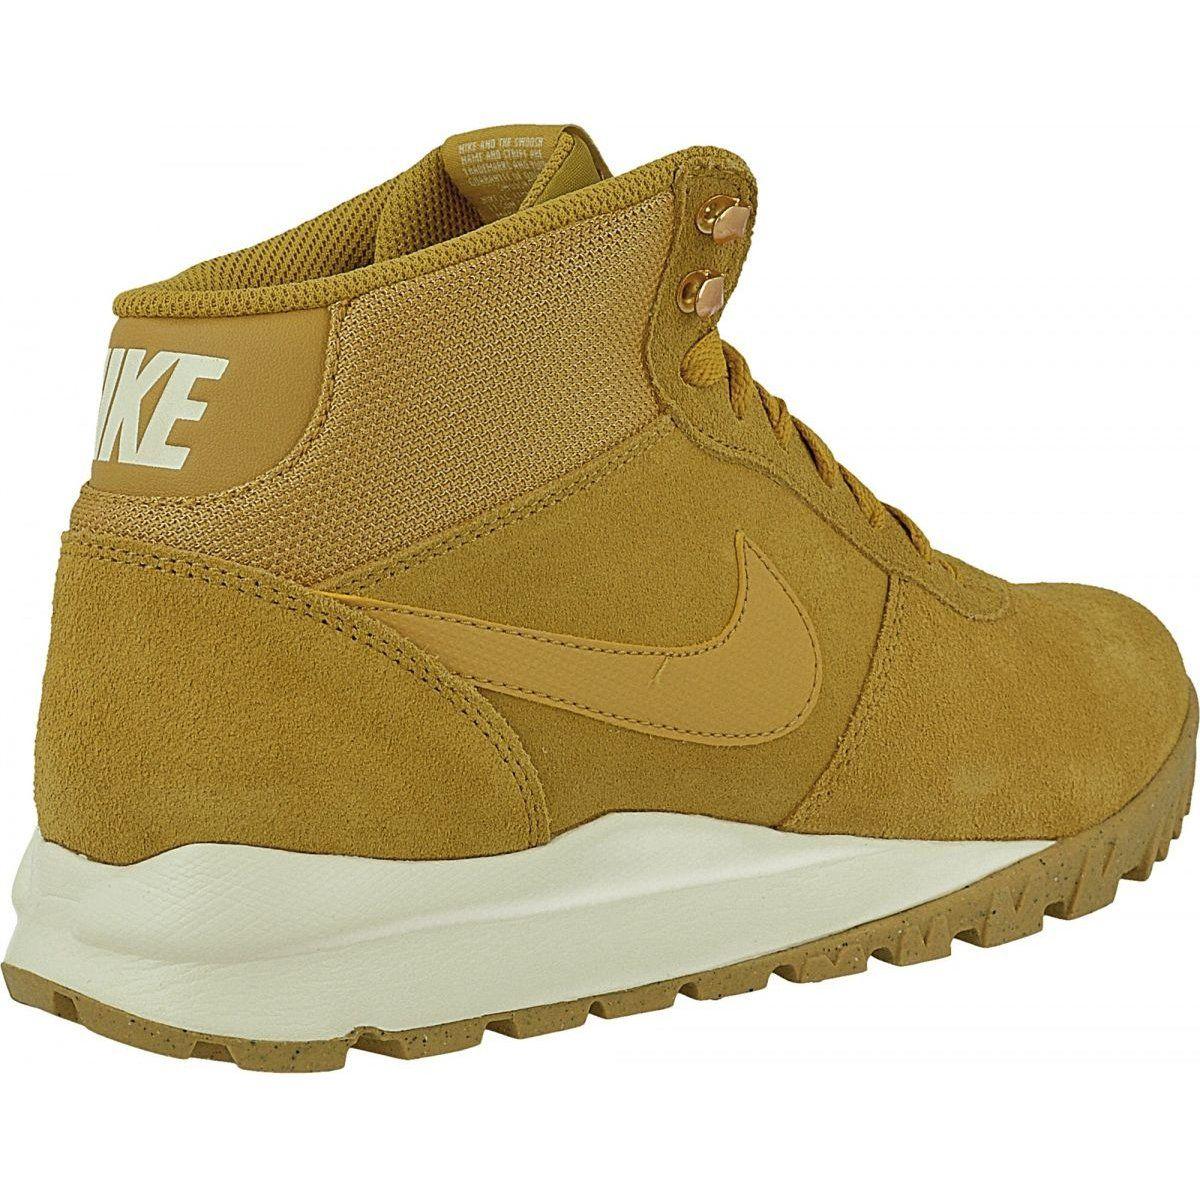 Buty Zimowe Nike Hoodland Suede M 654888 727 Brazowe Wielokolorowe Winter Boots Mens Nike Shoes Nike Shoes